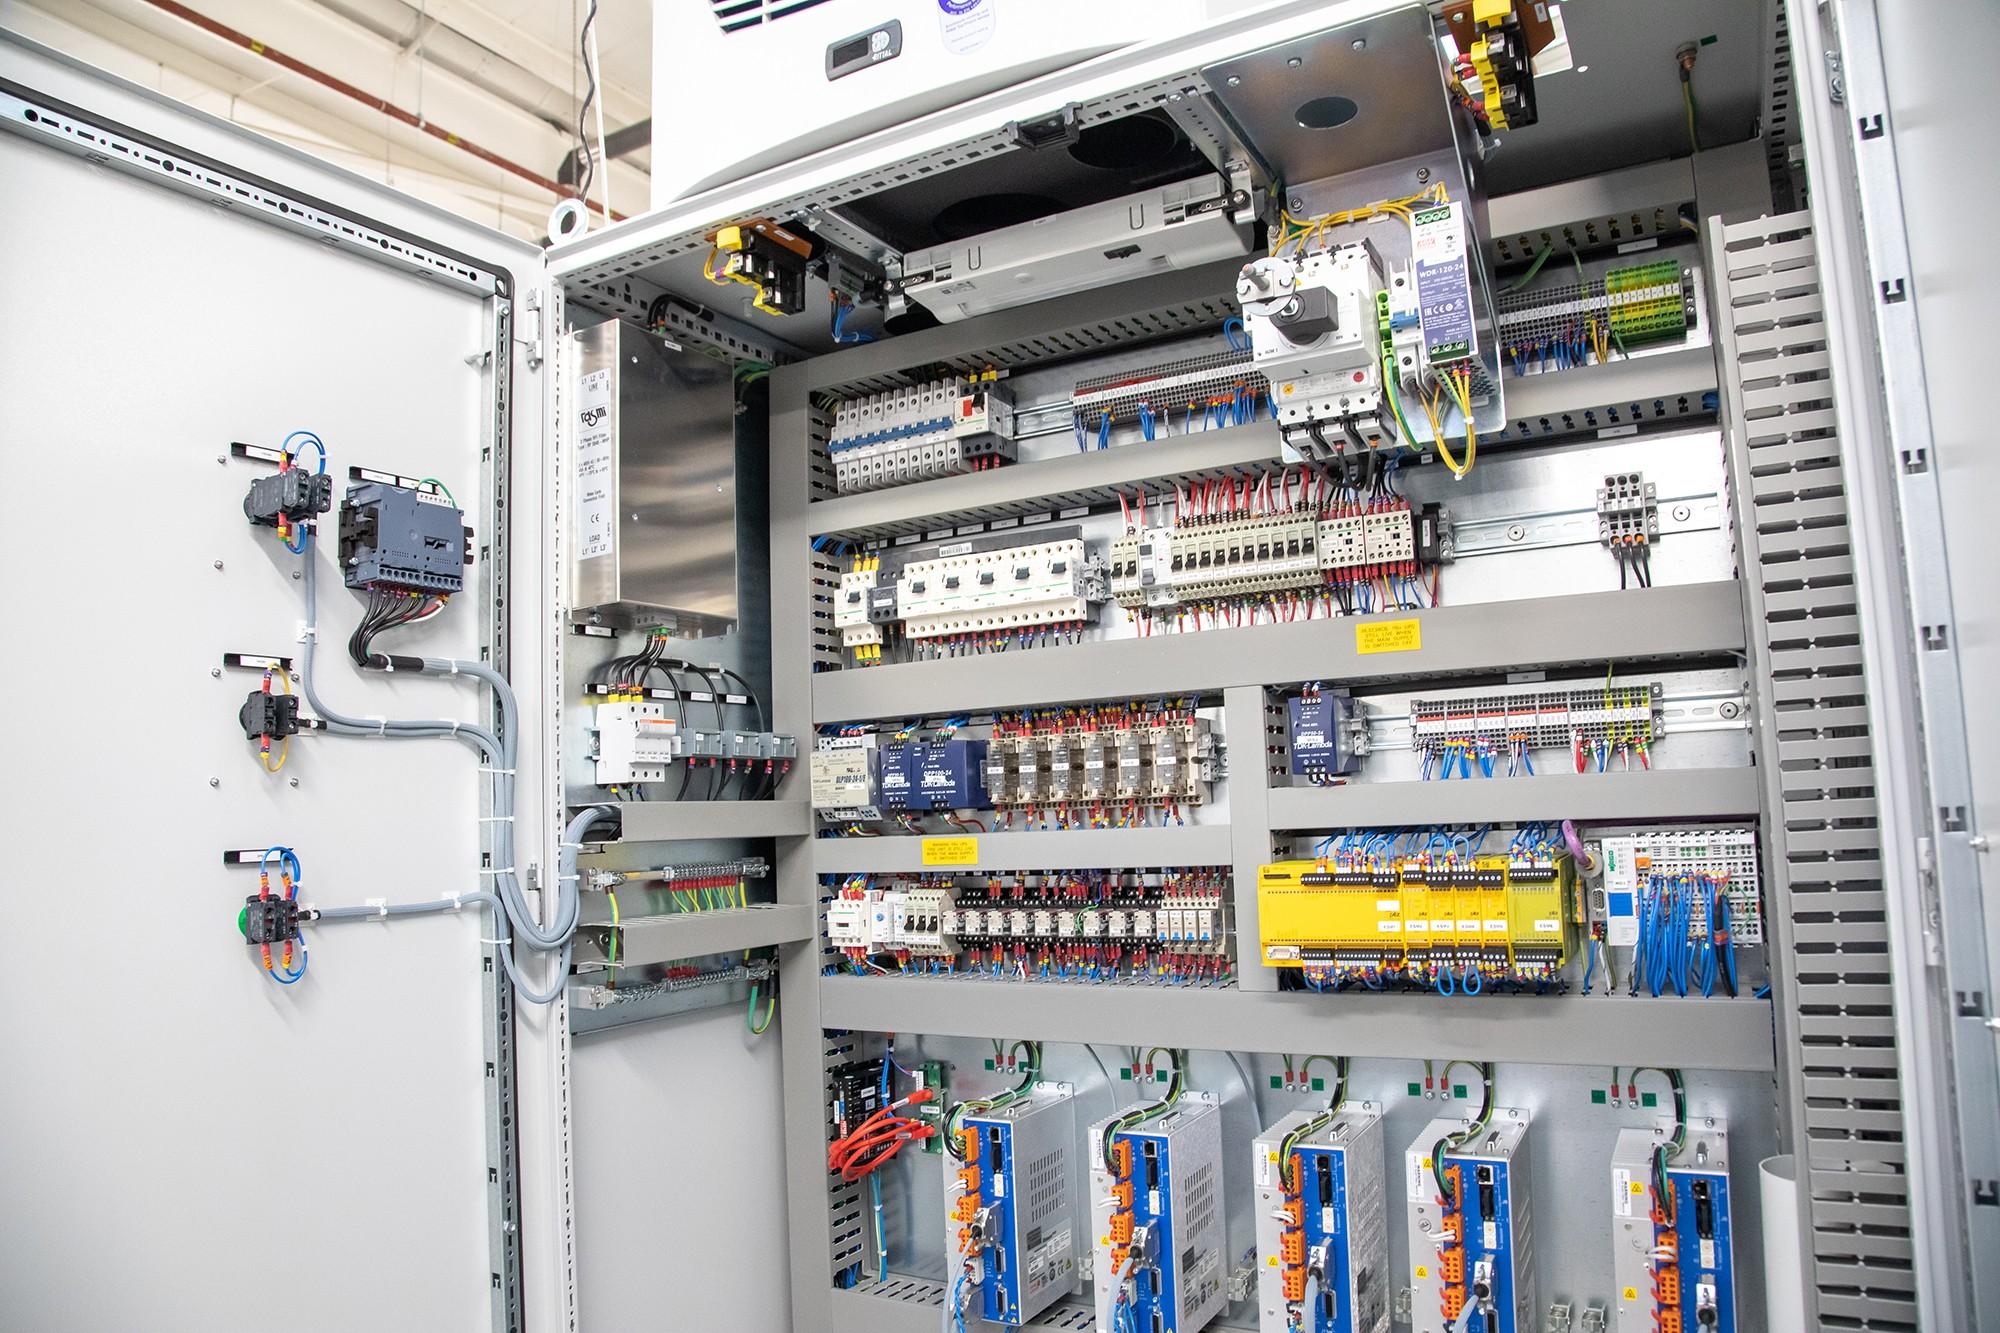 Control & Automation » pp 156 » PP Control & Automation